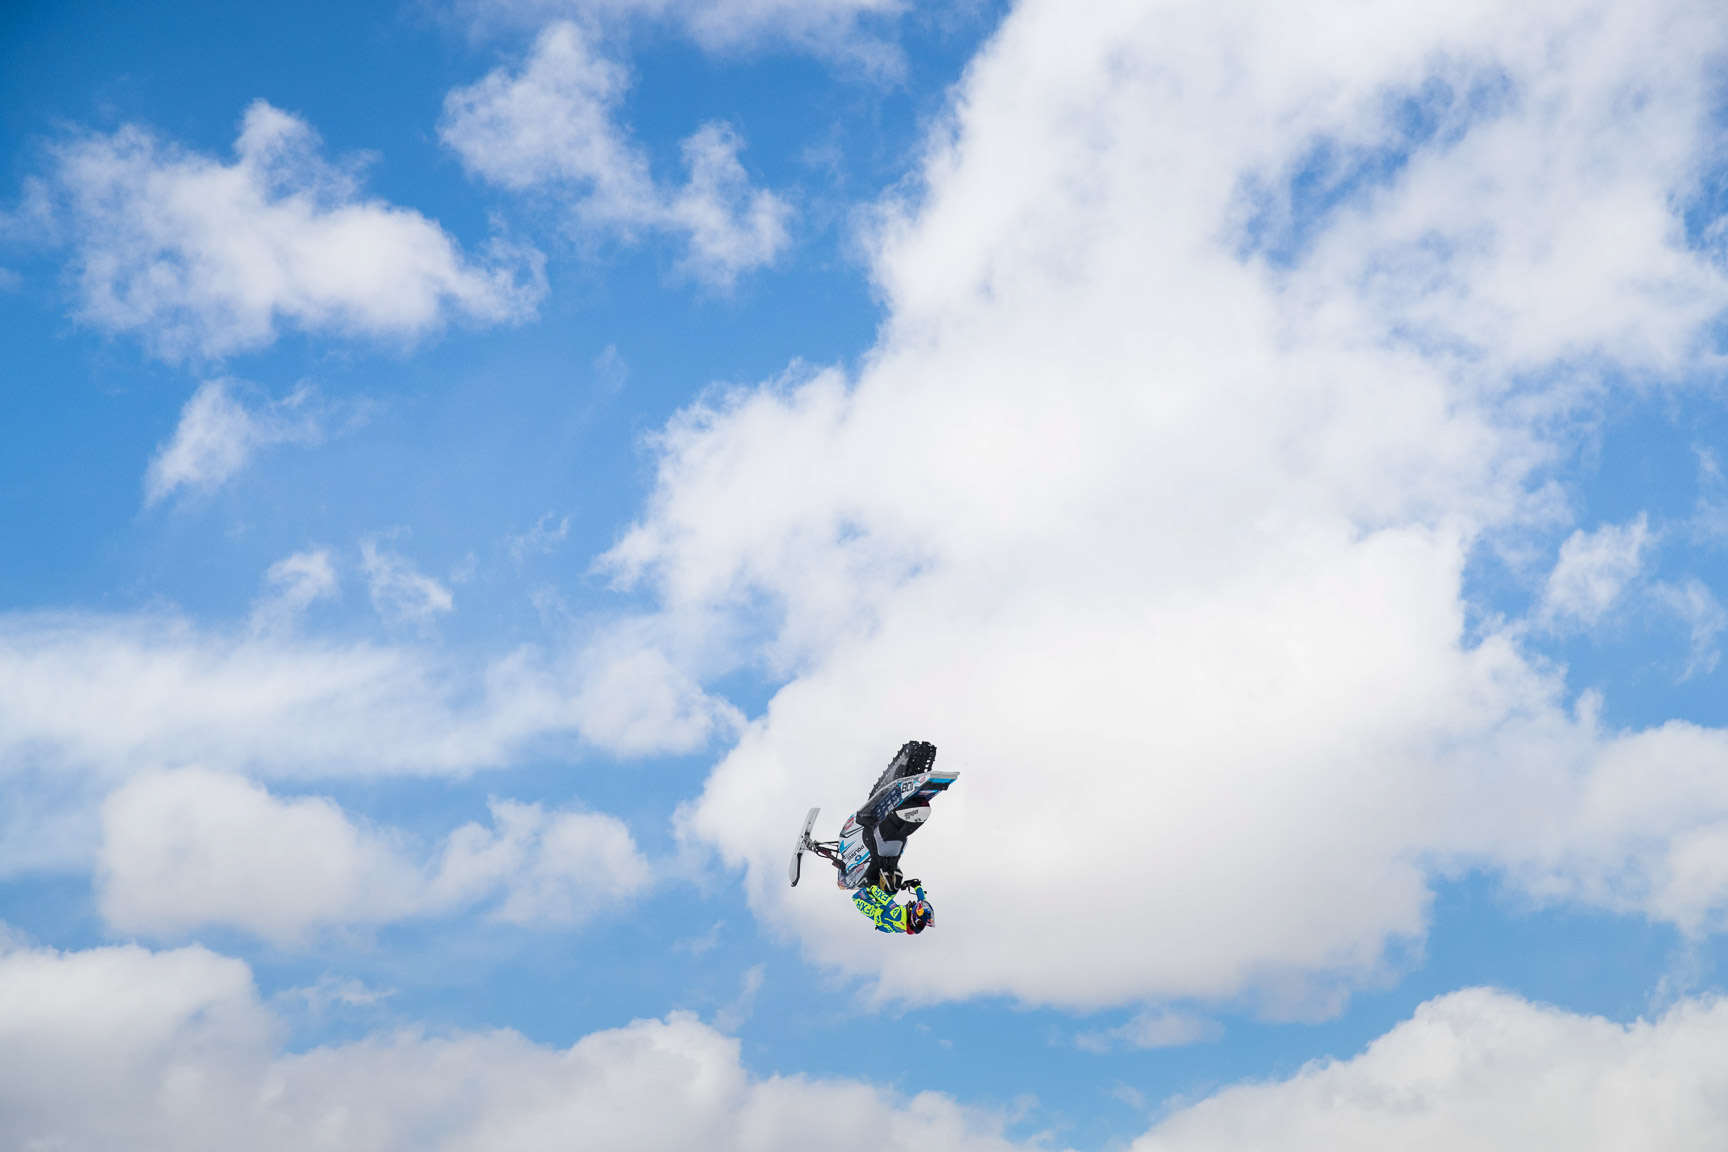 Levi LaVallee, Snomobile Freestyle practice